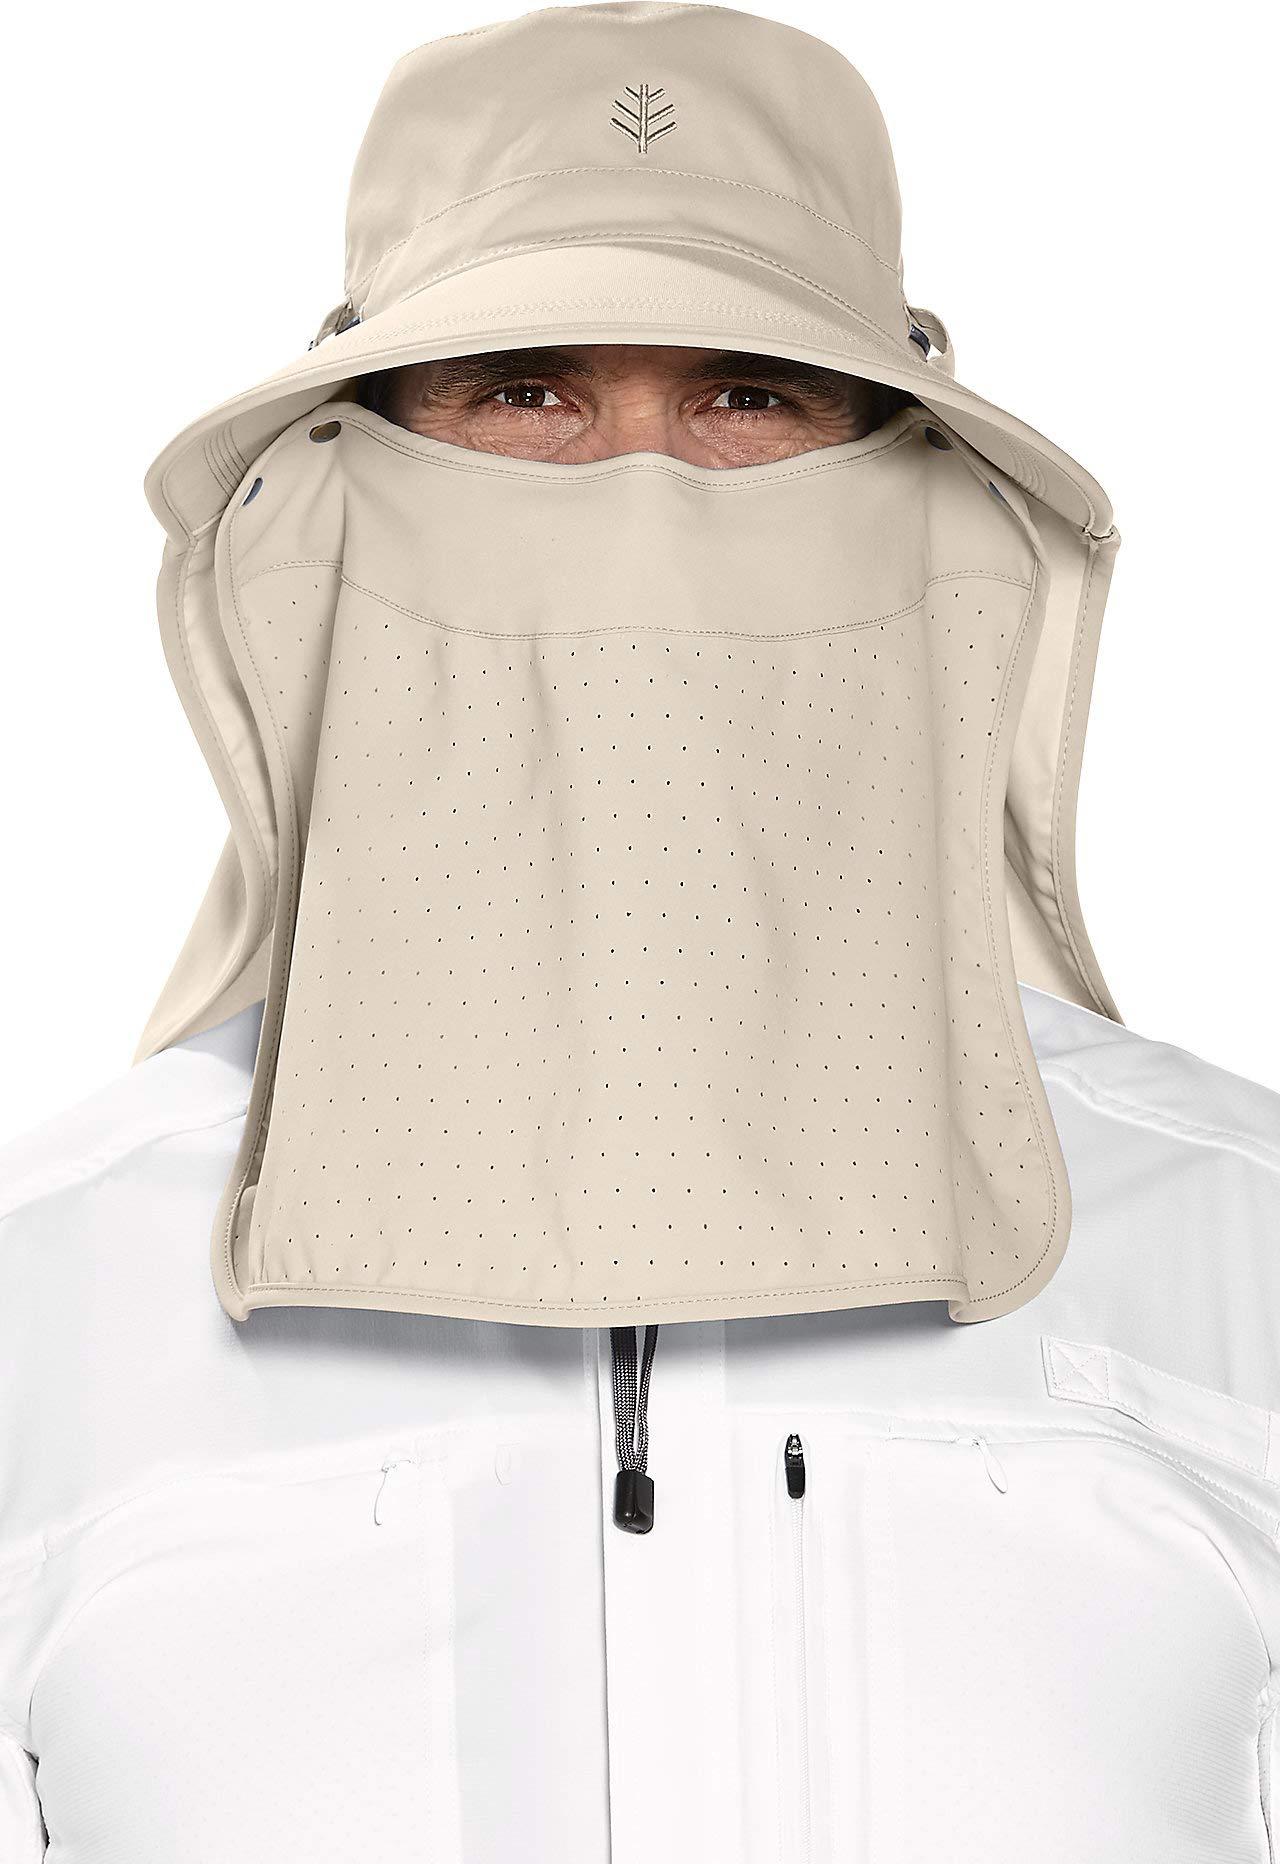 Coolibar UPF 50+ Women's Men's Ultra Sun Hat - Sun Protective (One Size- Stone)